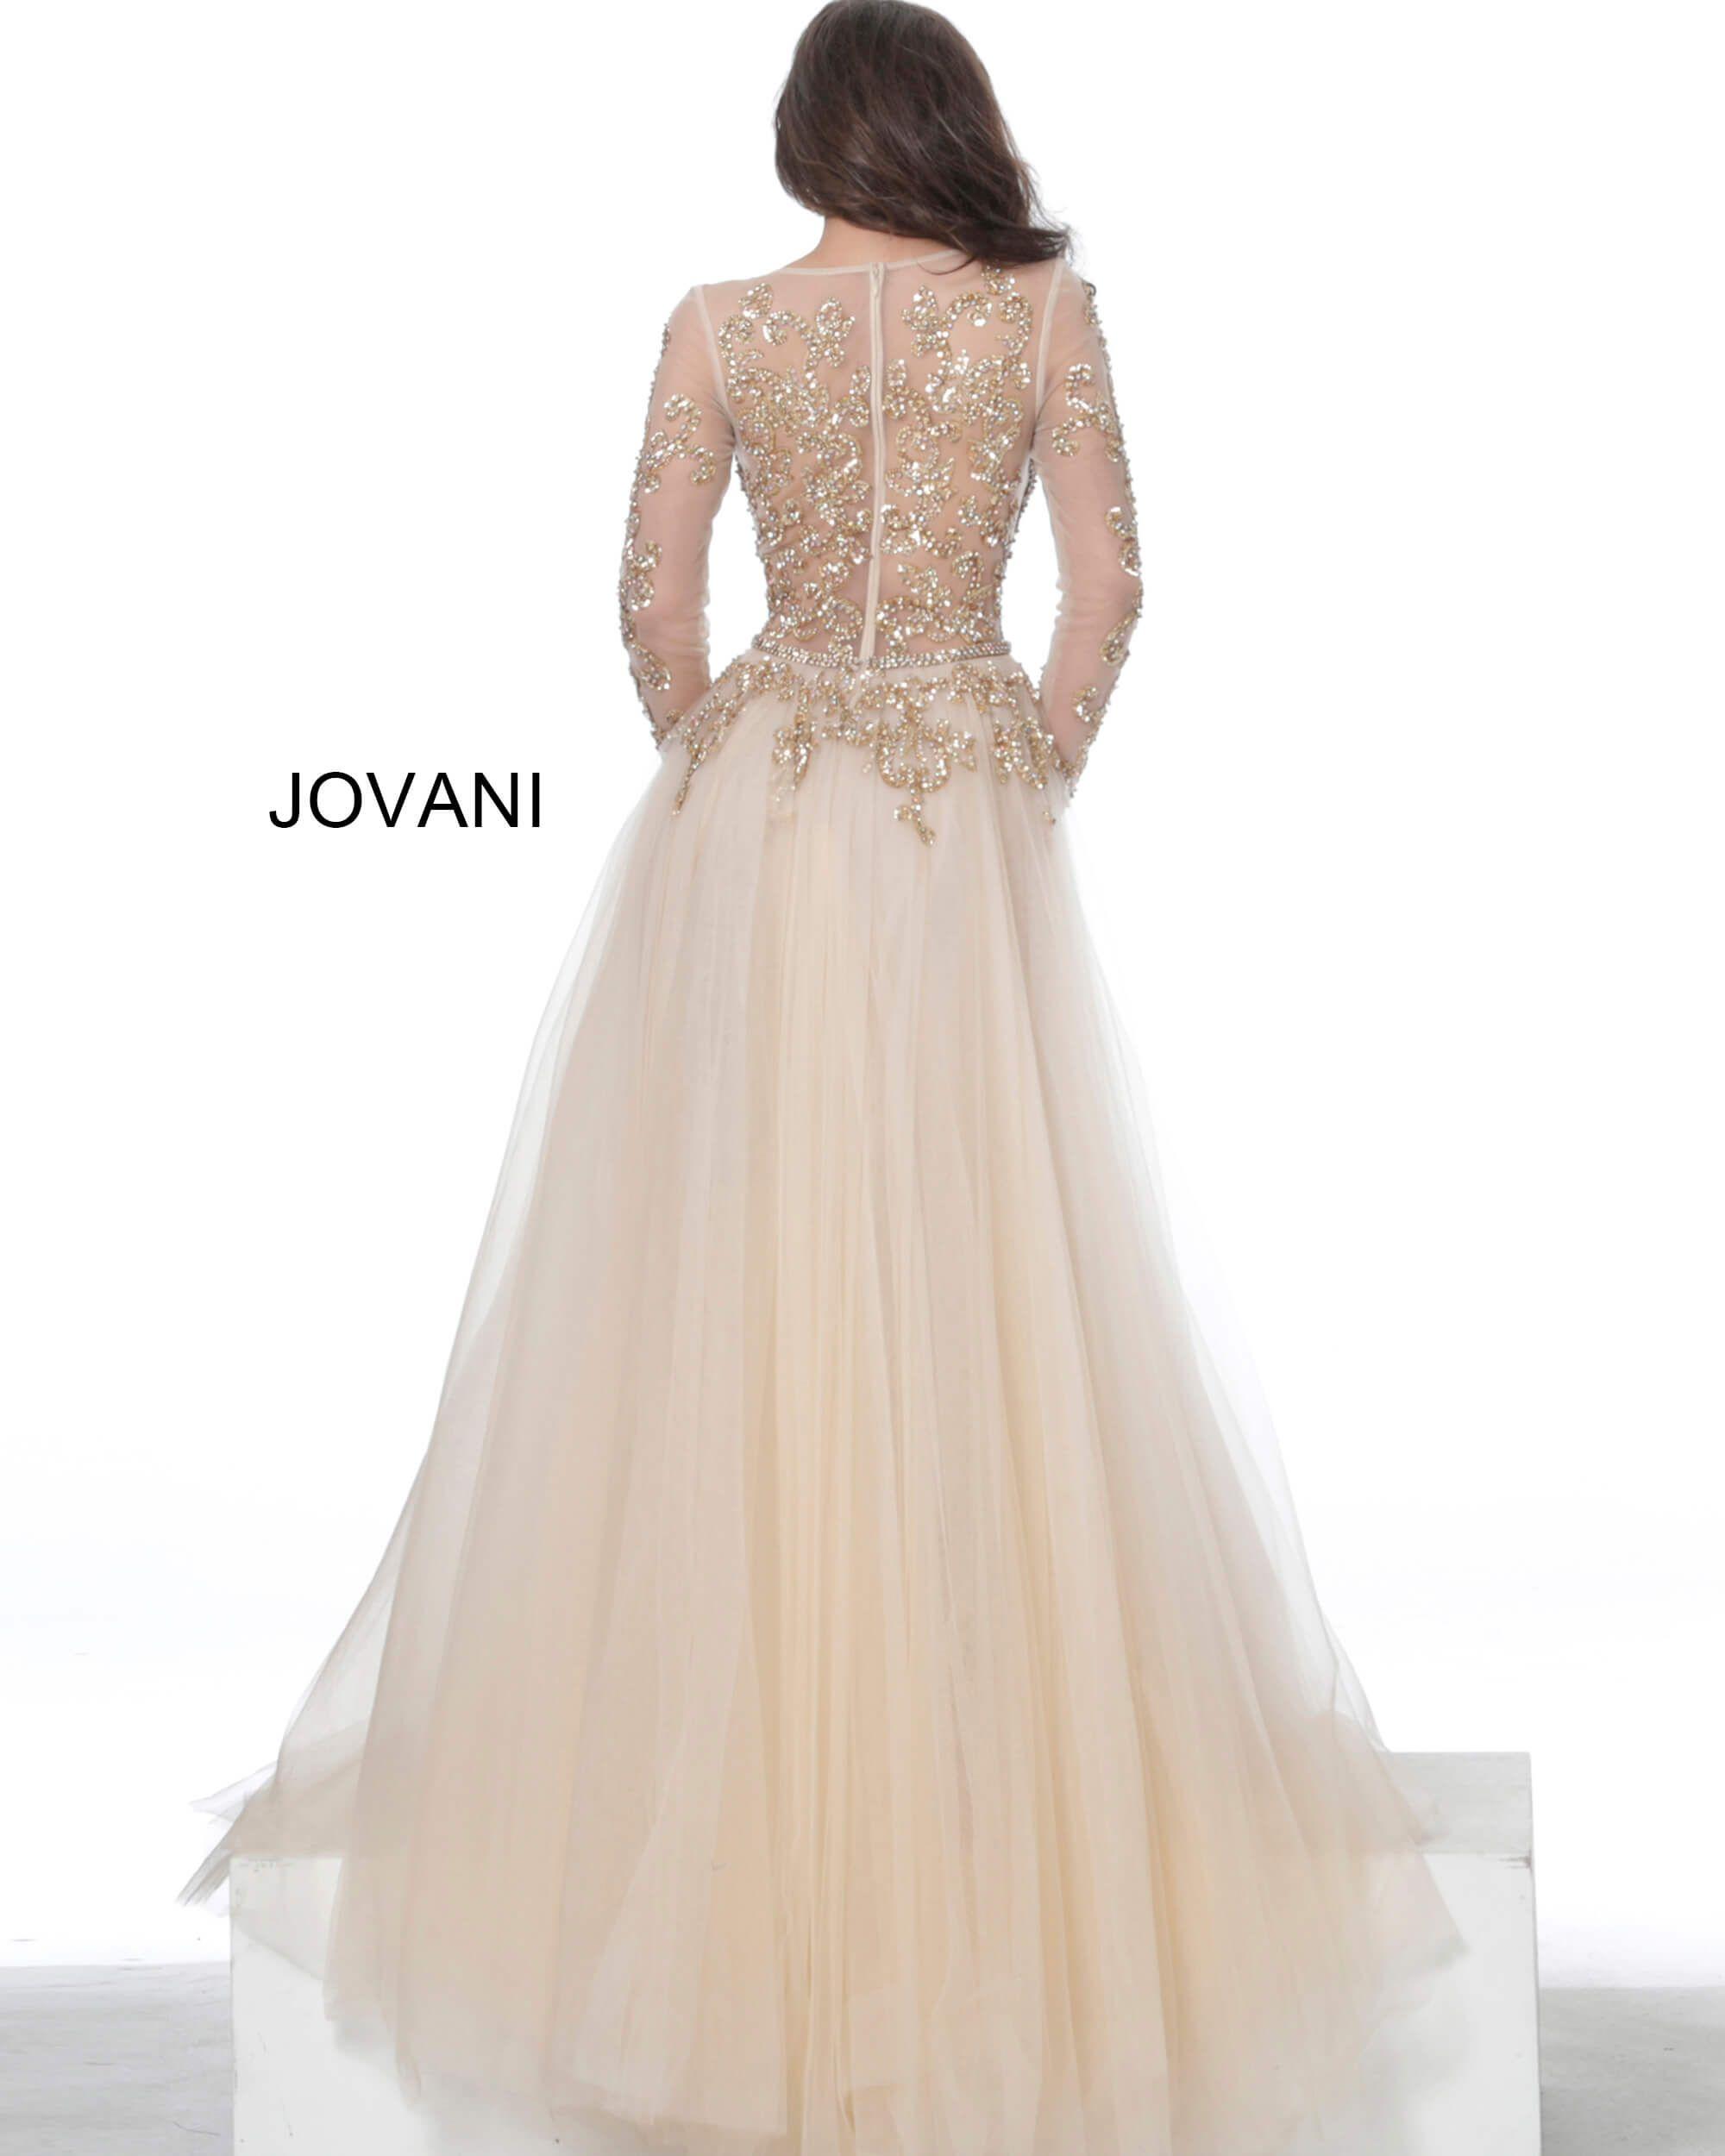 Jovani Dress 00638 Champagne Sheer Long Sleeve Ballgo In 2021 Sparkle Wedding Dress Wedding Dress Long Sleeve Bodice Wedding Dress [ 2500 x 2000 Pixel ]